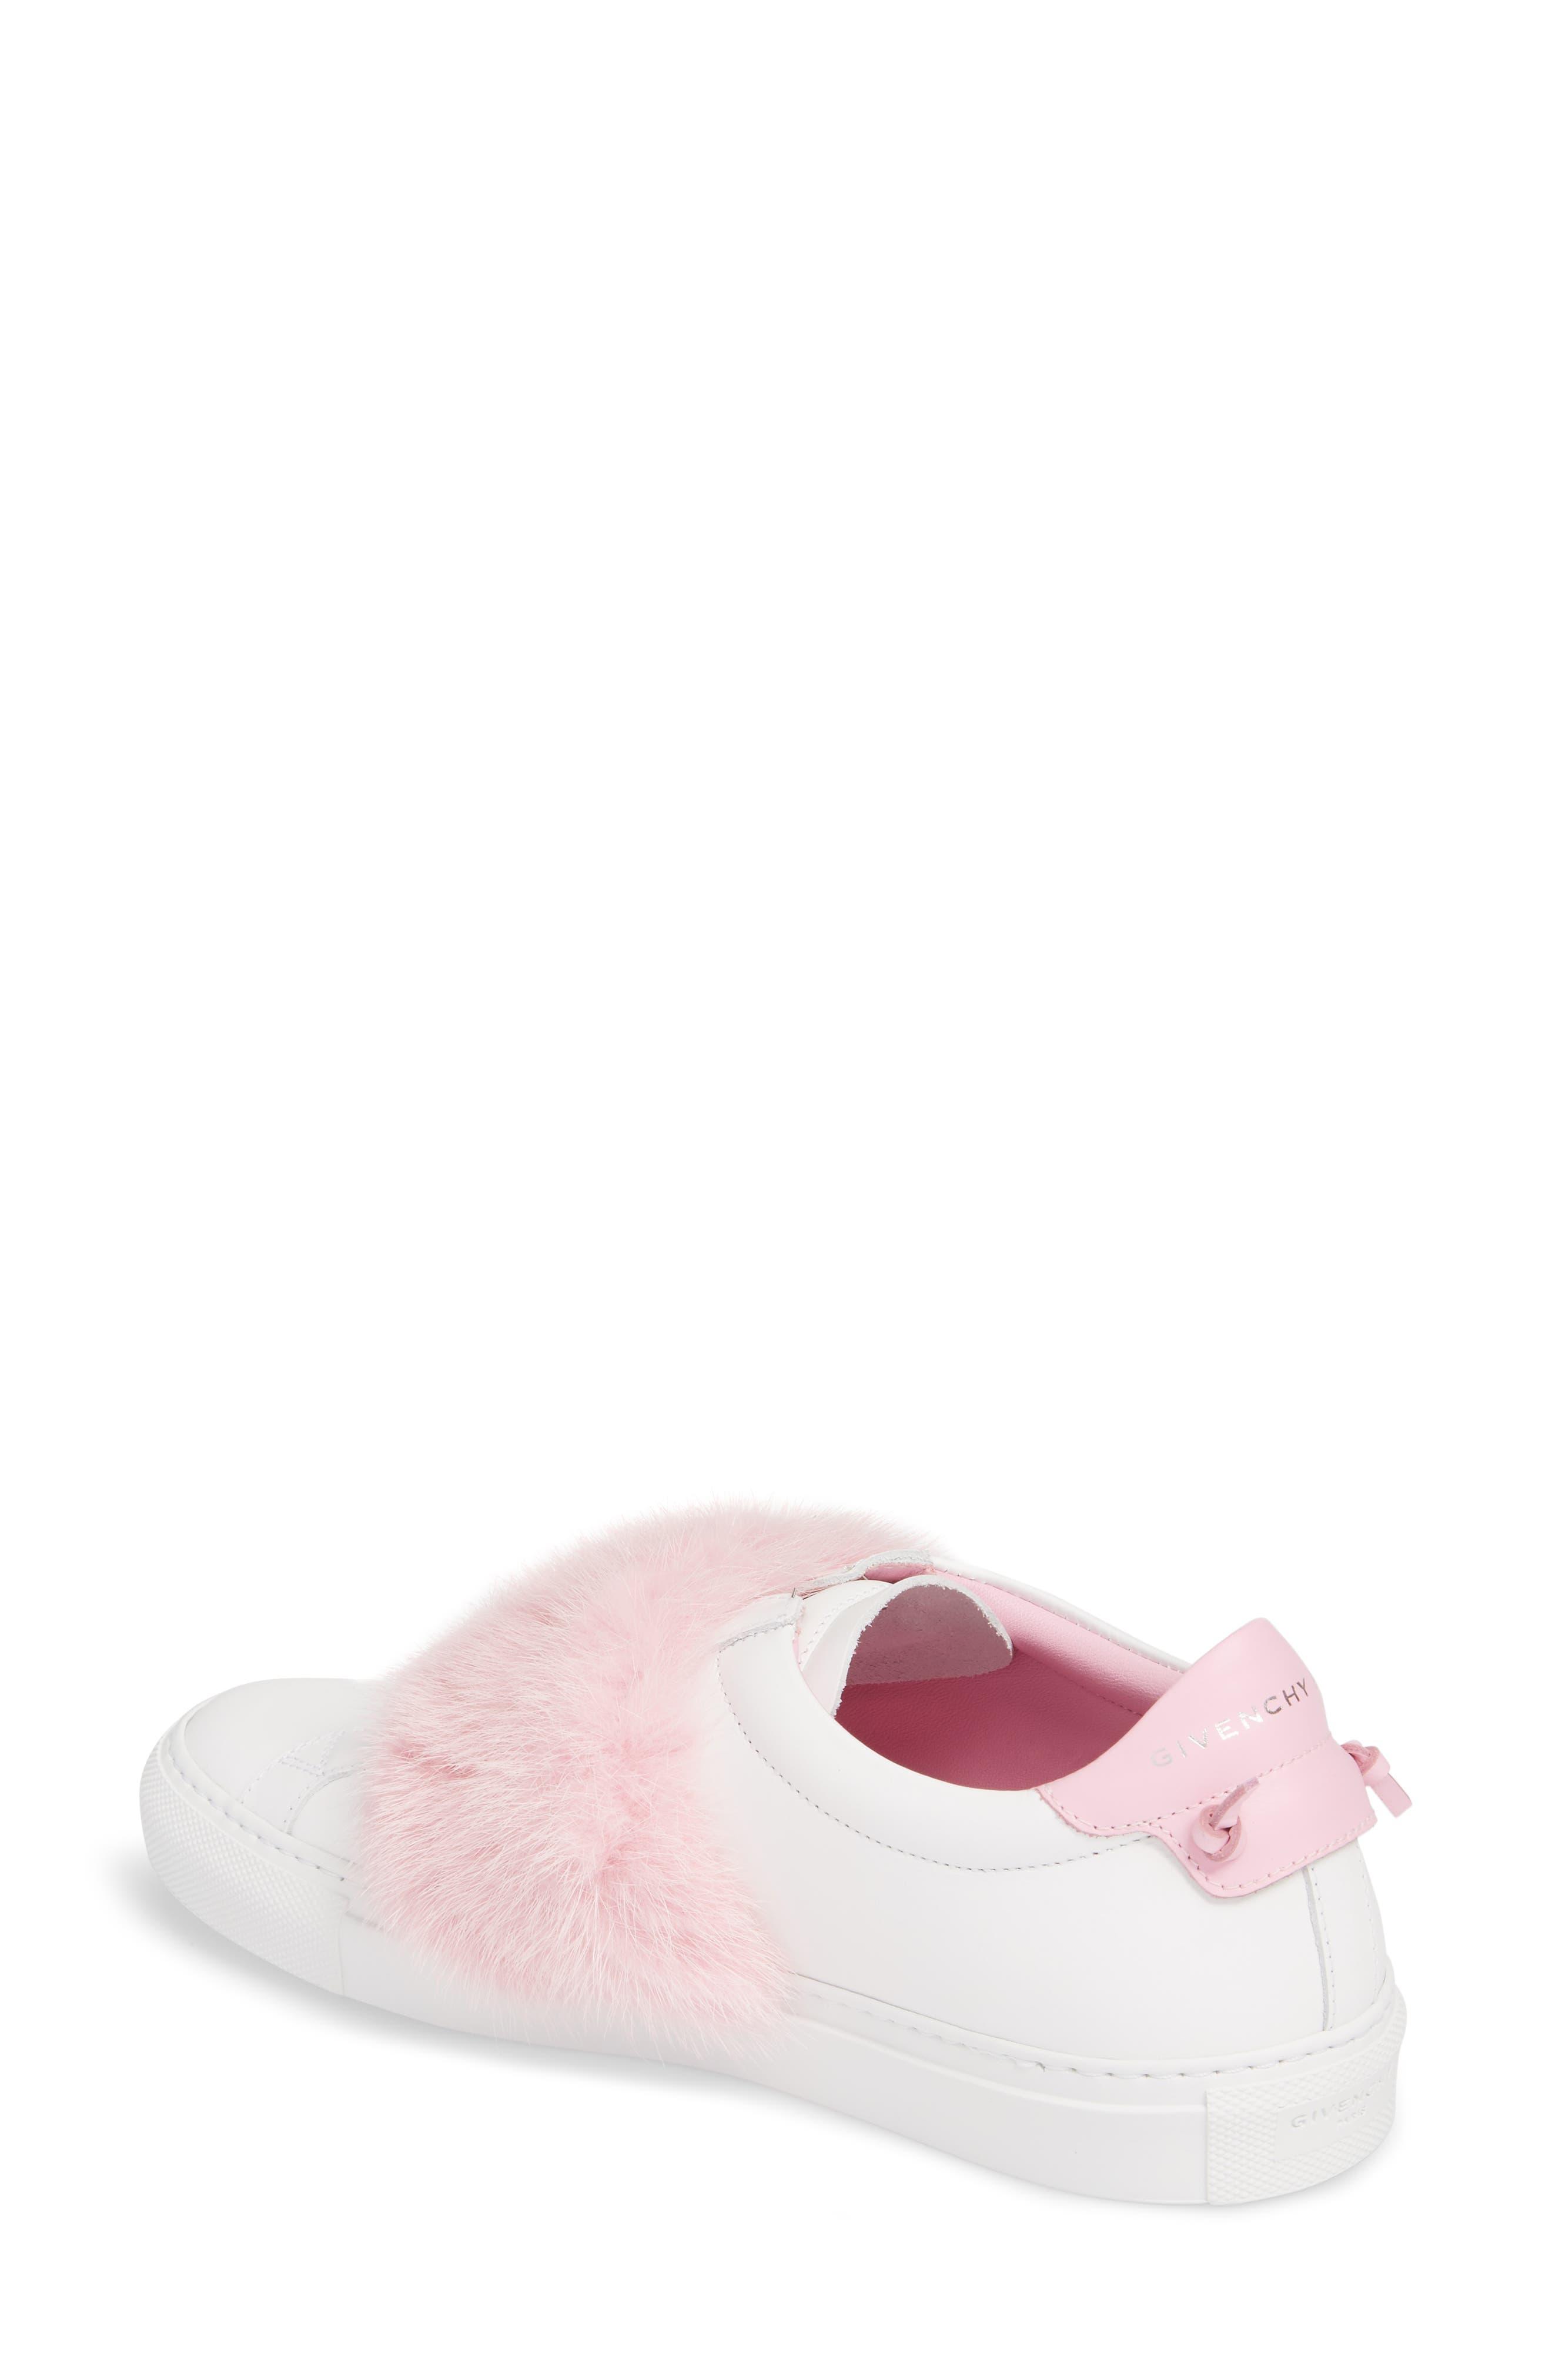 Urban Street Slip-On Sneaker with Genuine Mink Fur Trim,                             Alternate thumbnail 2, color,                             White/ Pink